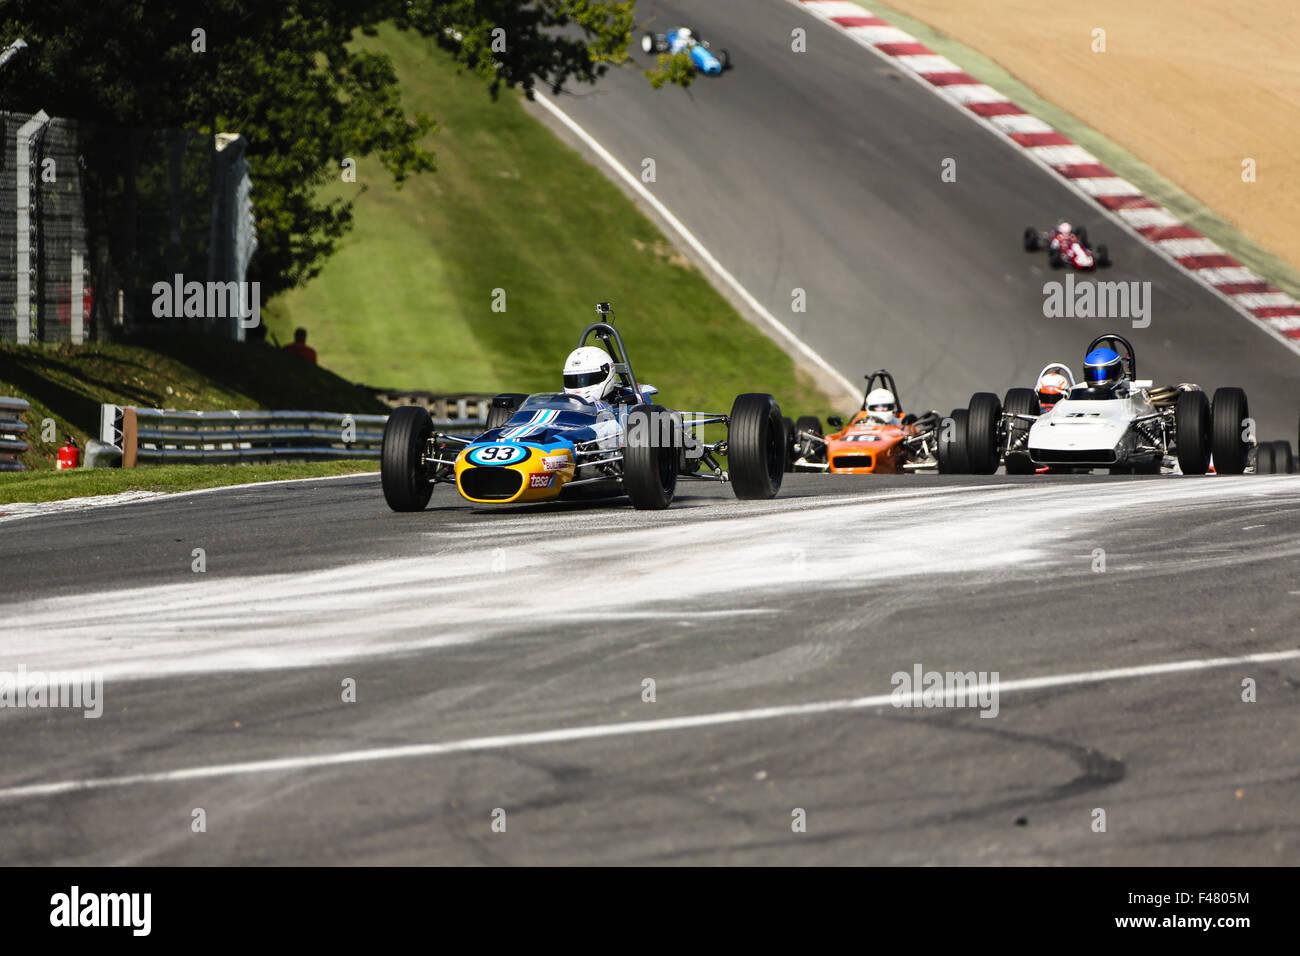 Formula 3 racing at Brands Hatch, England - Stock Image